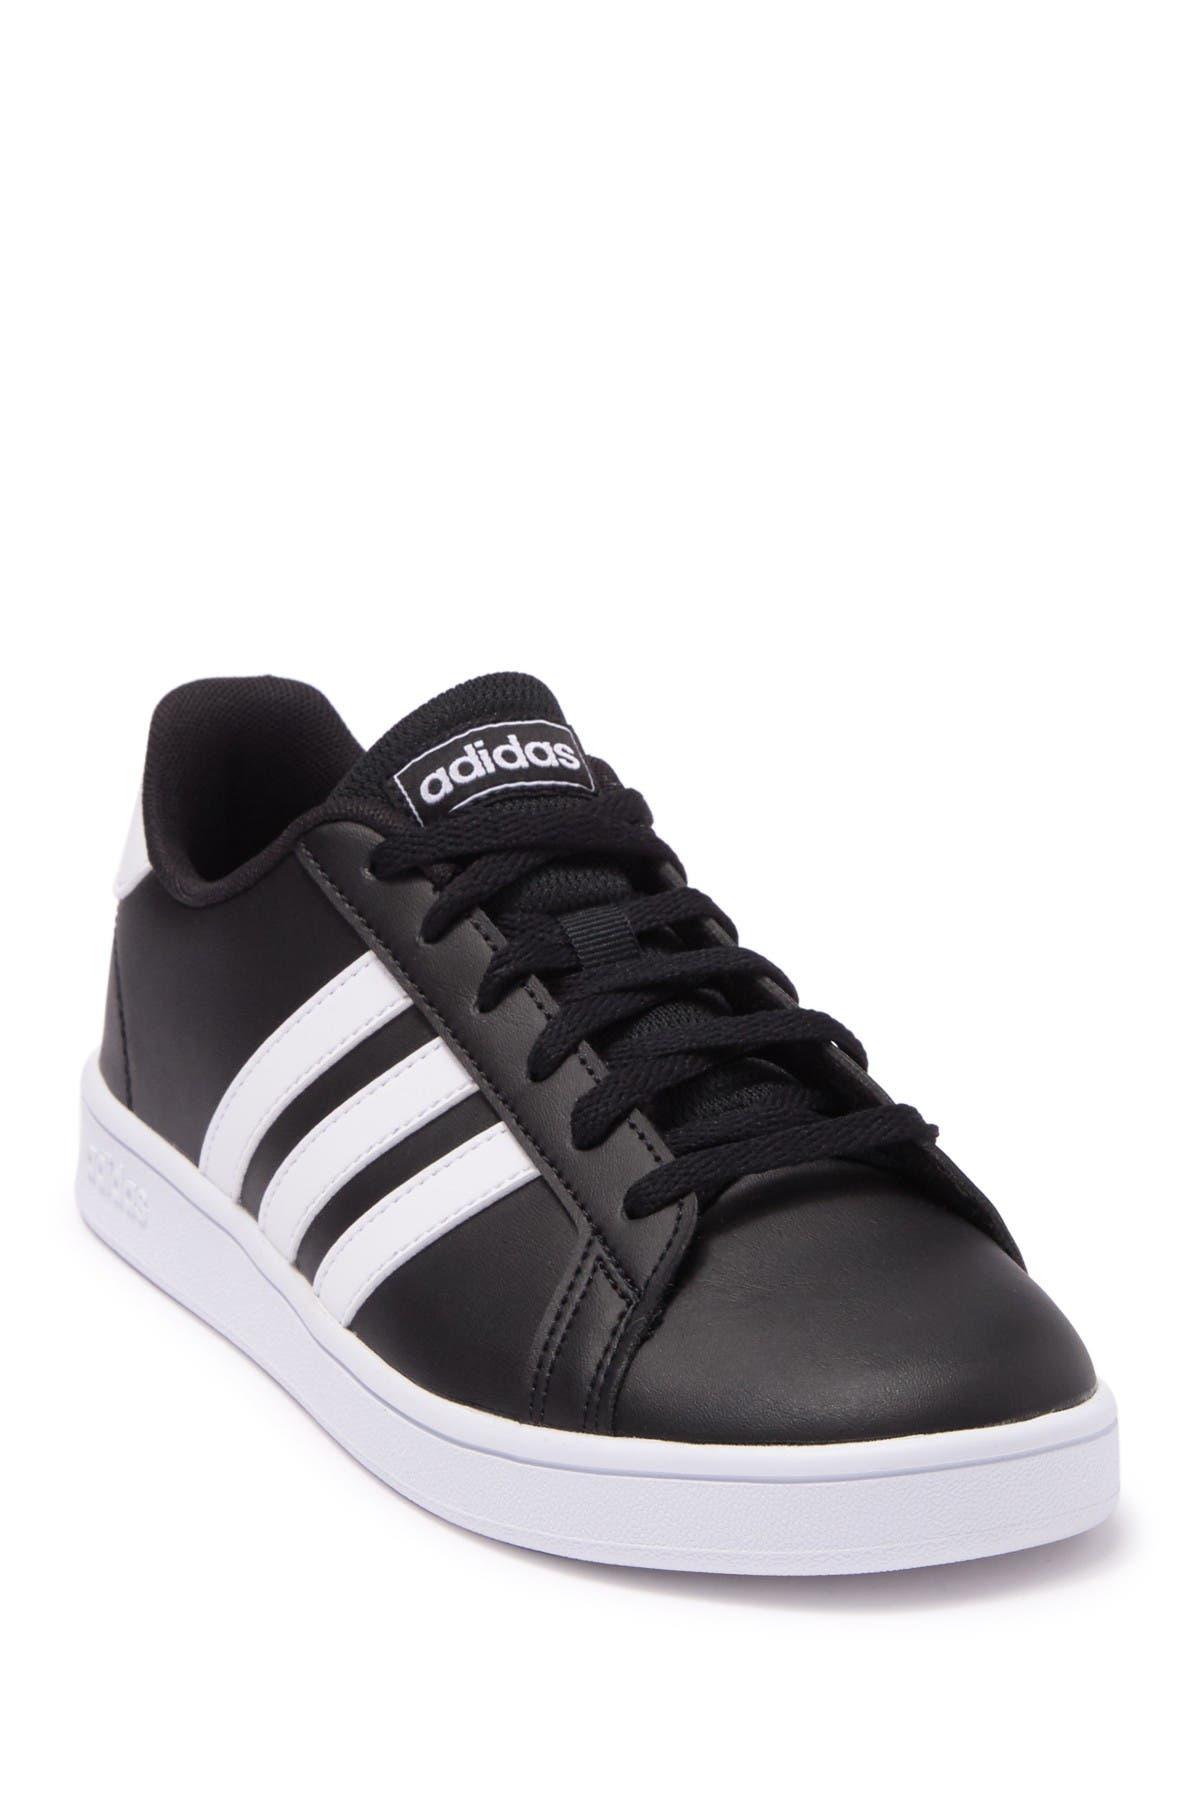 adidas | Grand Court Sneaker - Wide